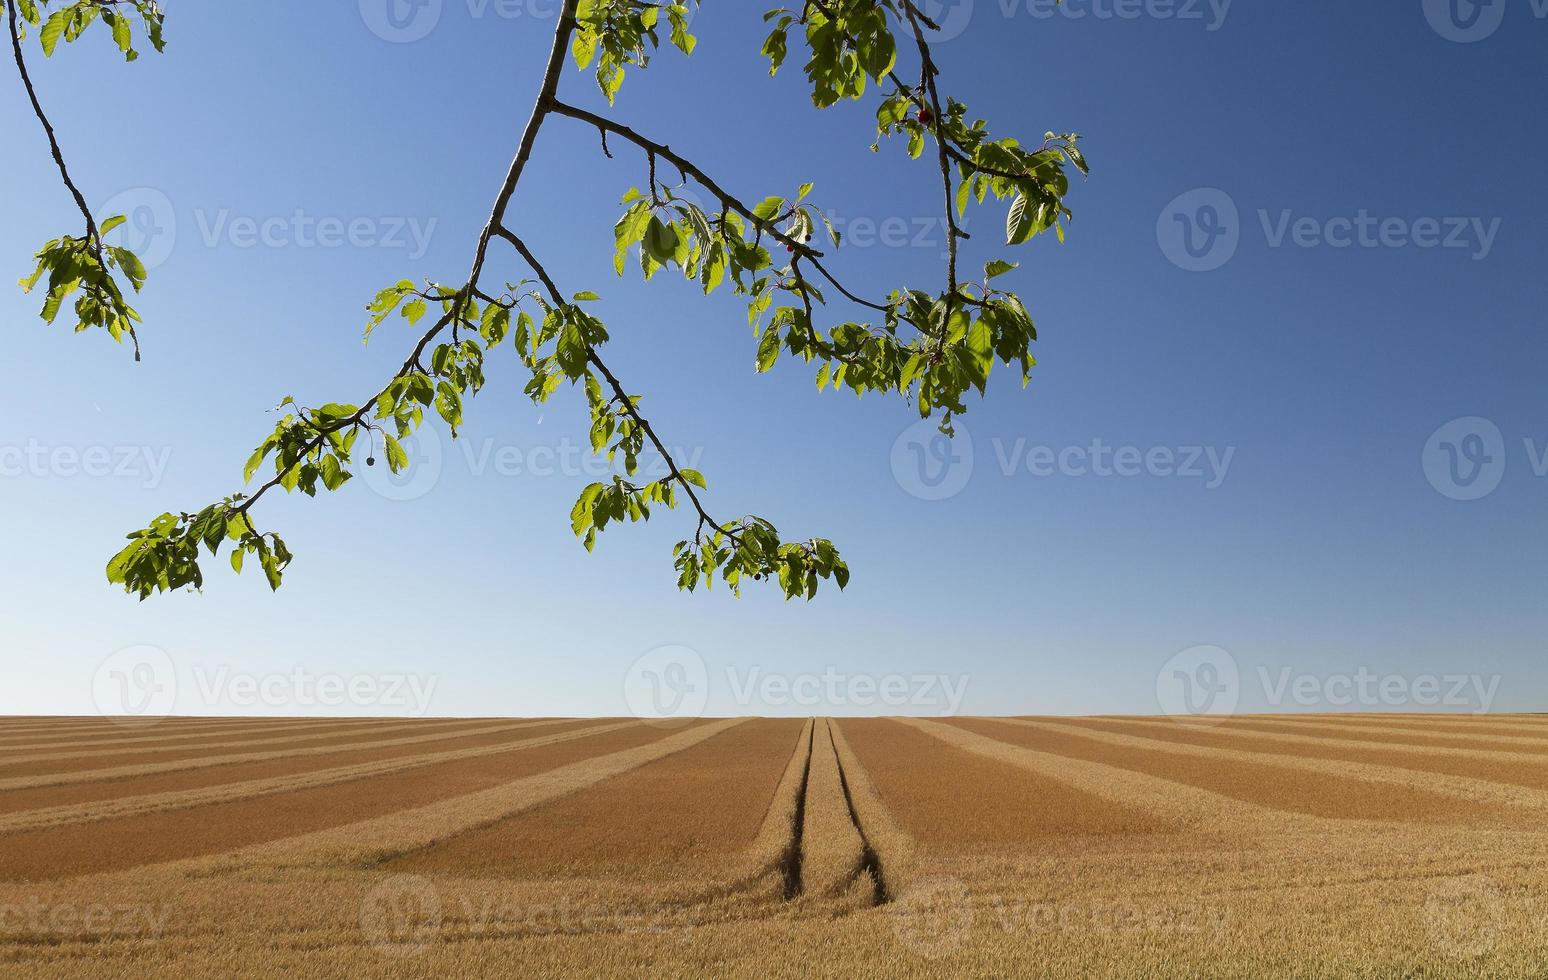 Endless wheatfield photo